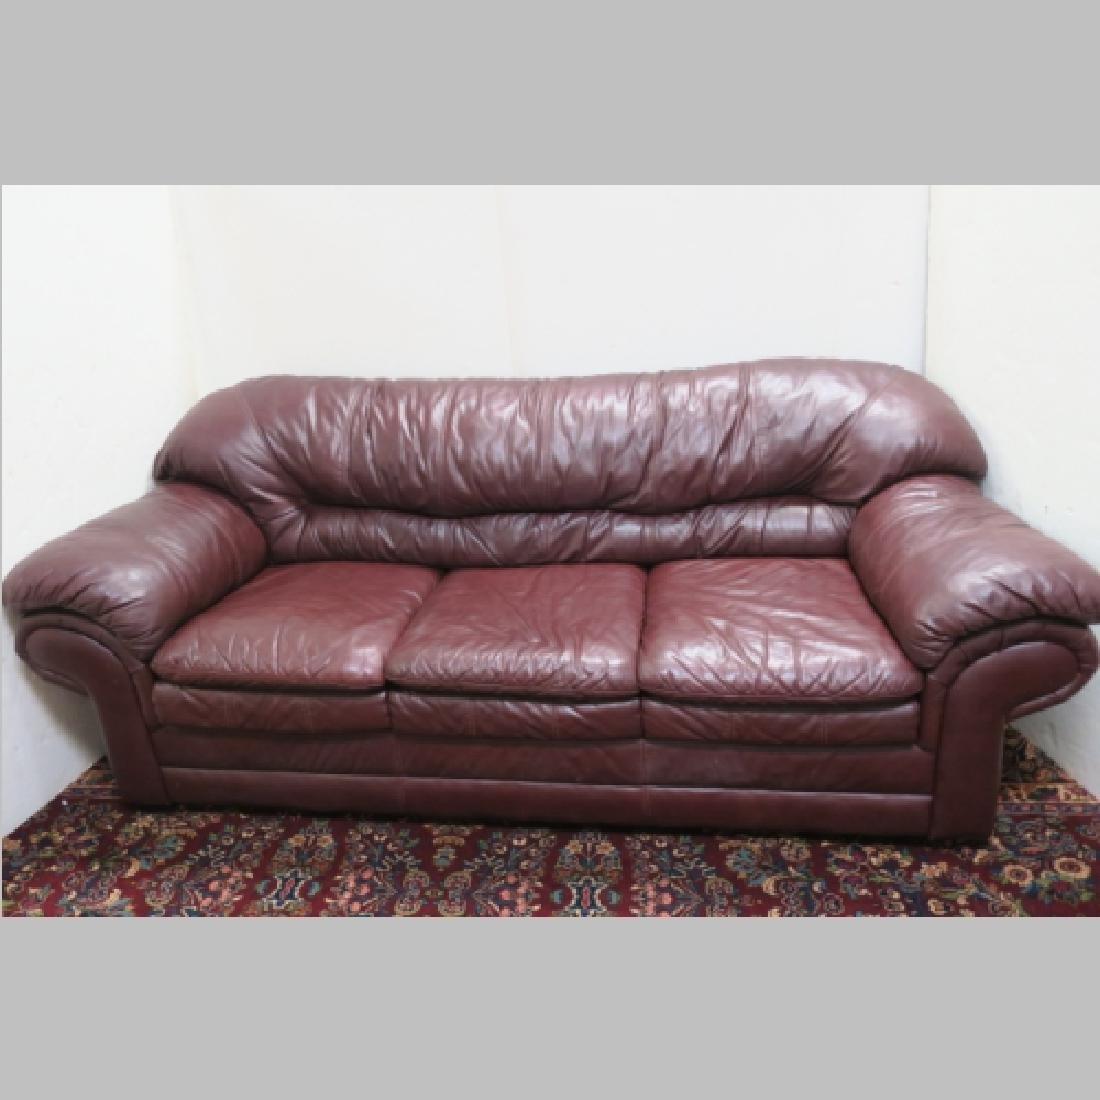 TOSCANA SAV PORTO Leather Sofa: